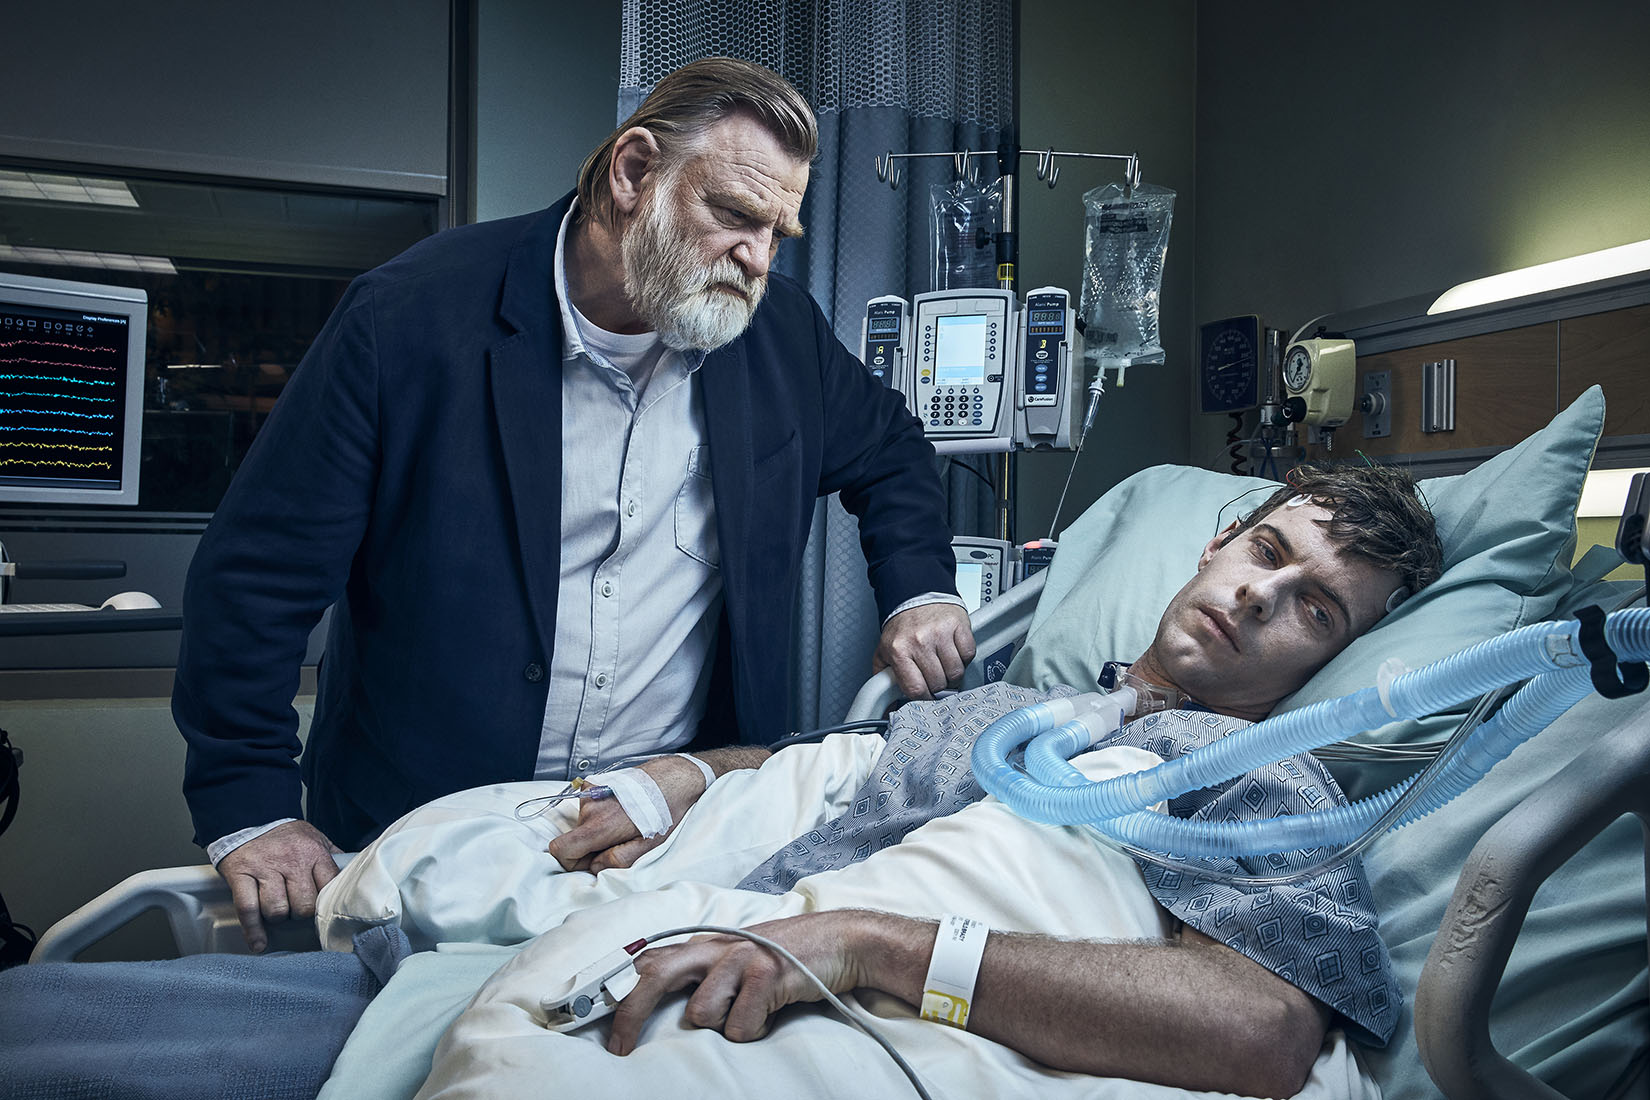 18MRM_Hospital2Shot_BillBrady_4000px_M2.jpg